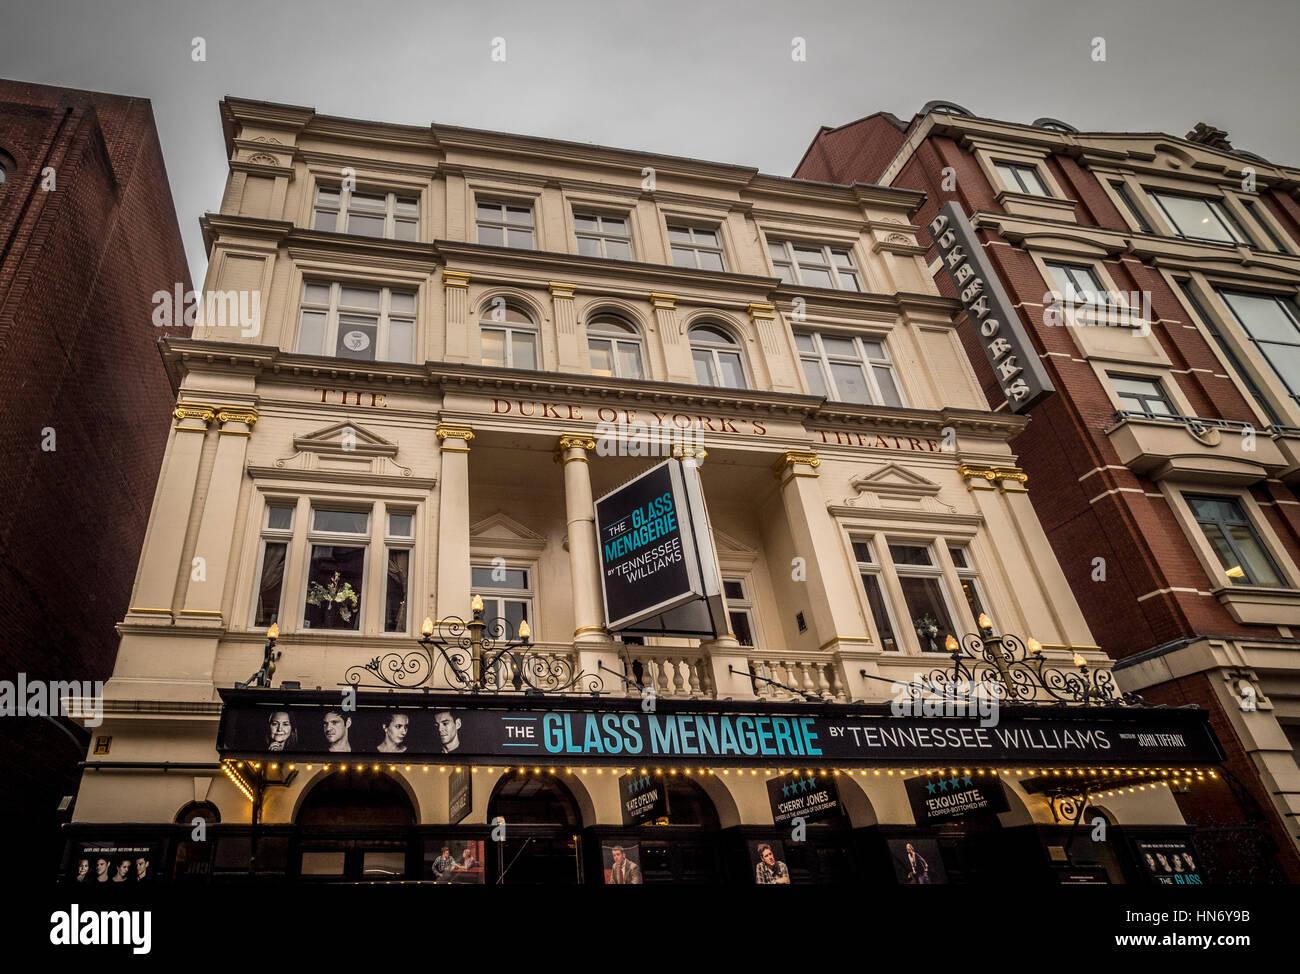 The Duke of York Theatre, St Martin's Lane, London WC2N 4BG, UK. - Stock Image